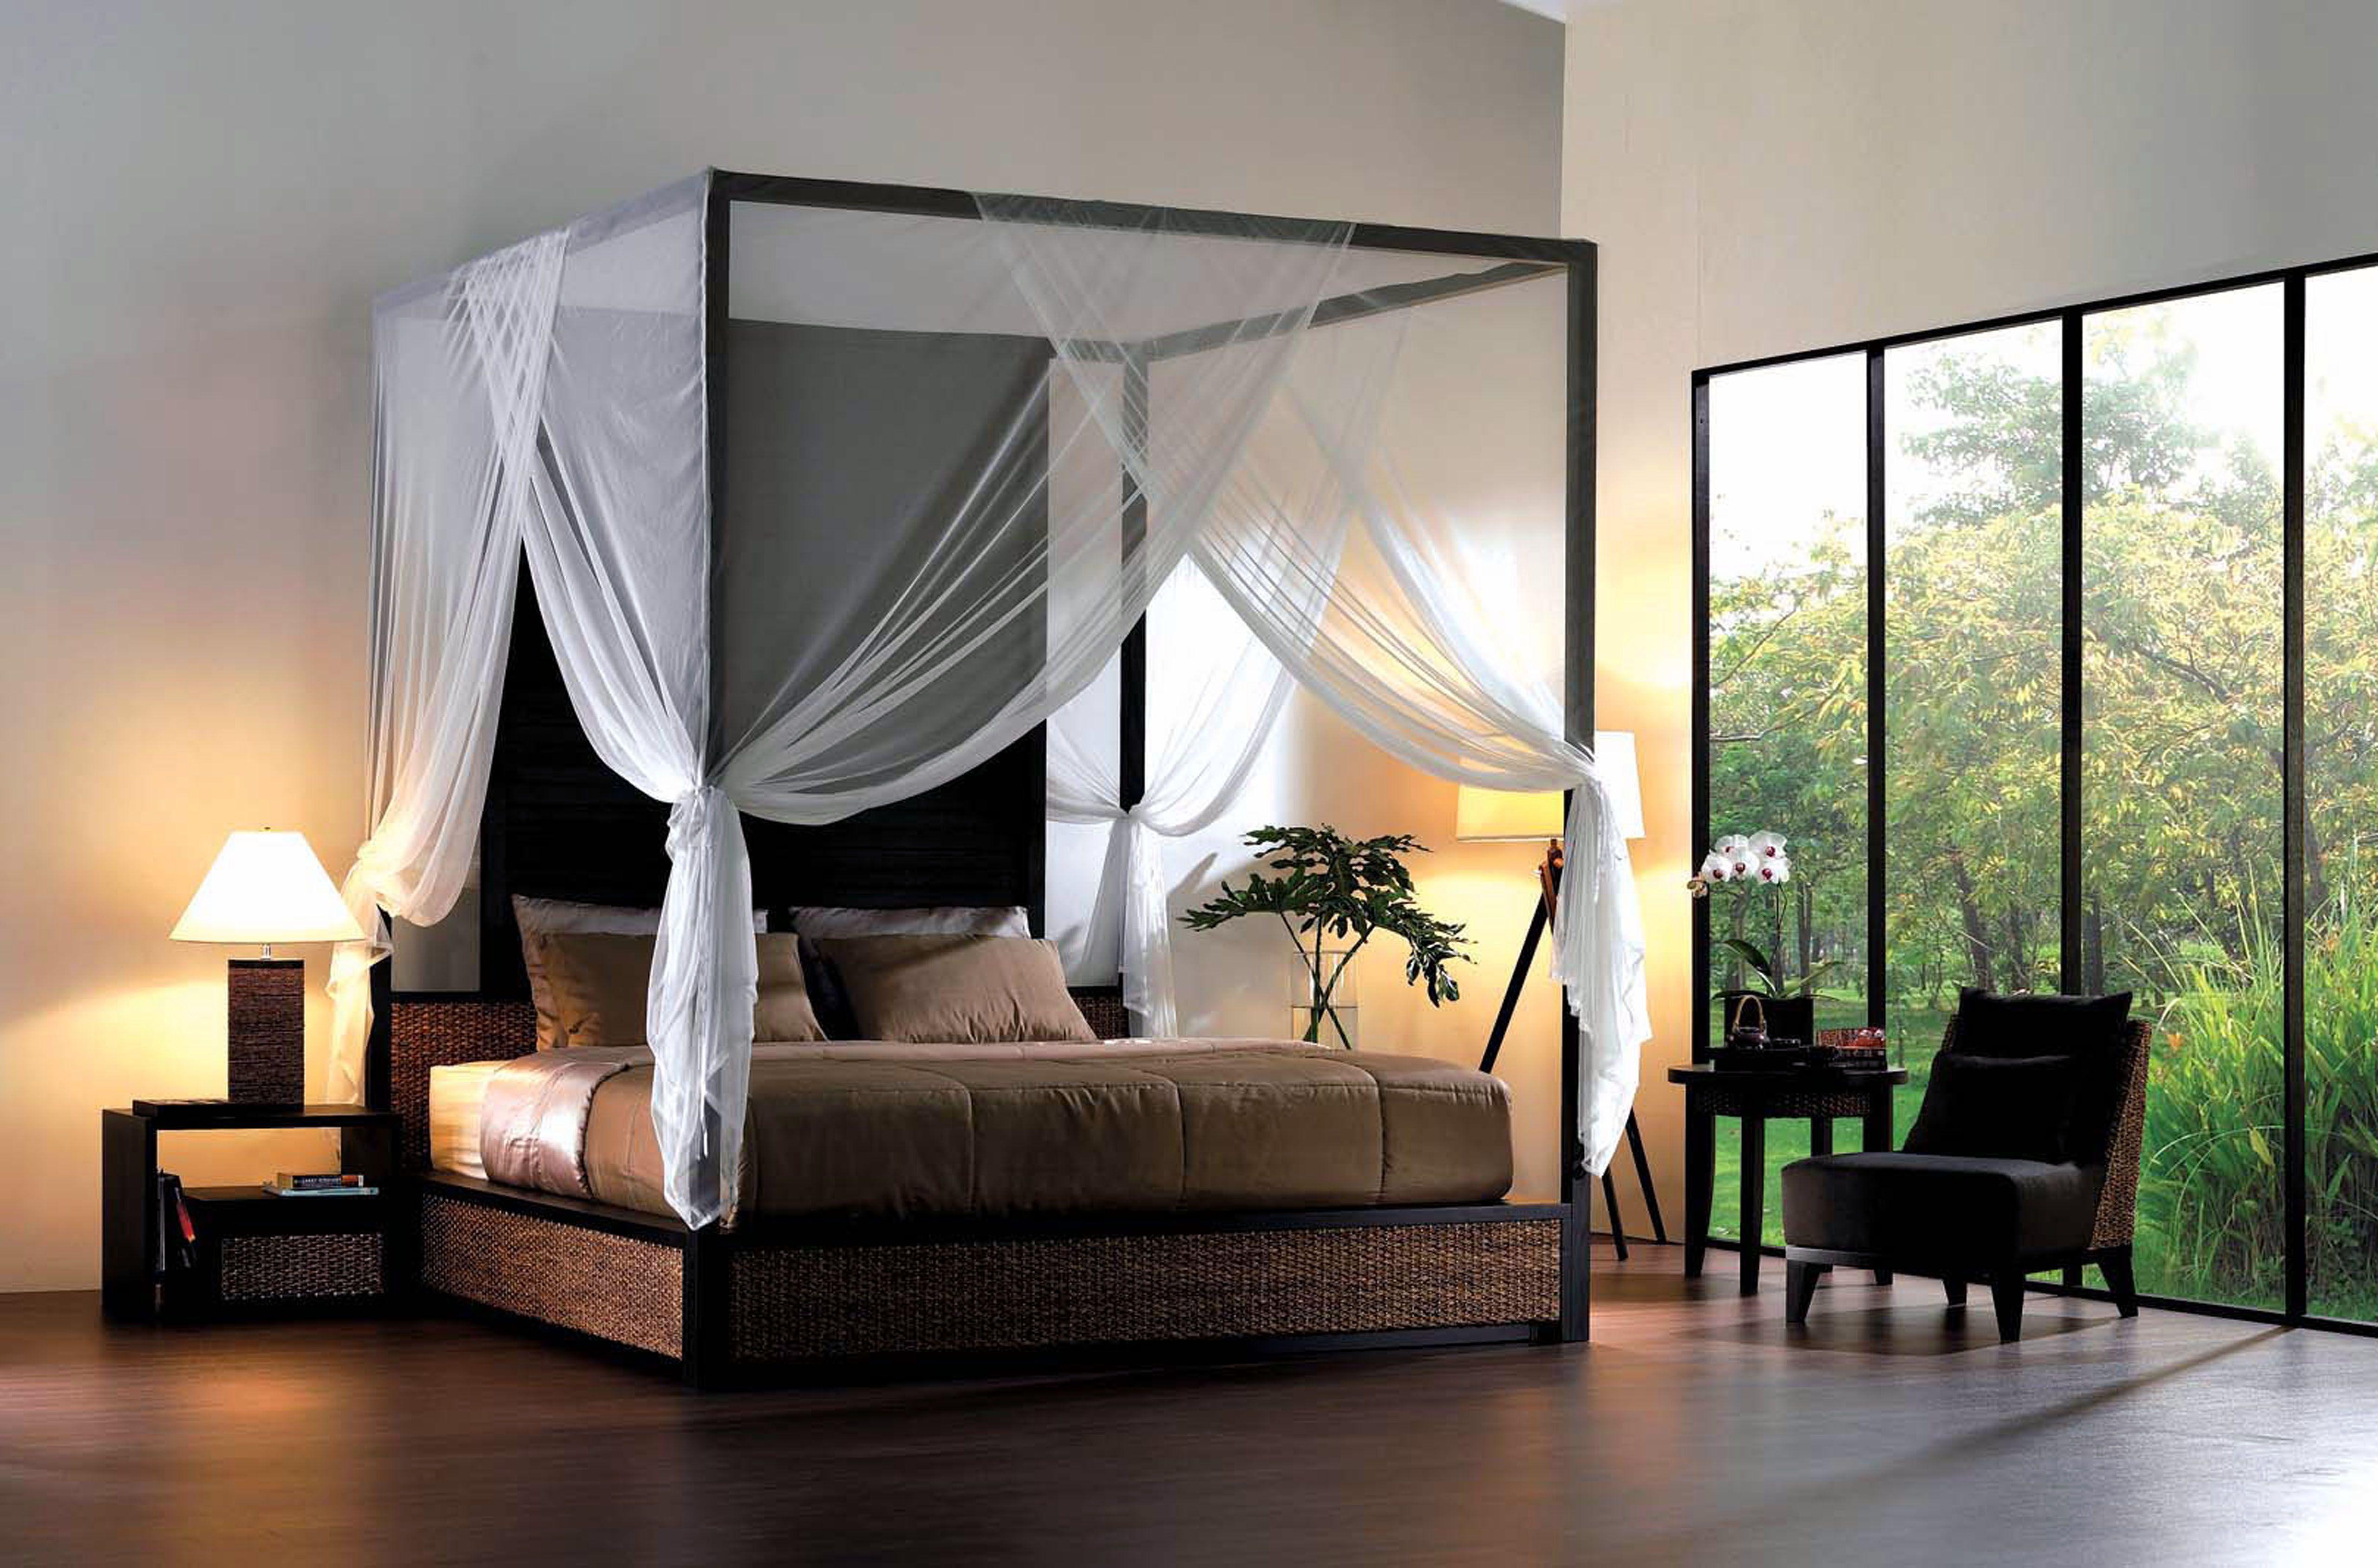 charmingbedroomdesigninspirationwithexquisitemodern